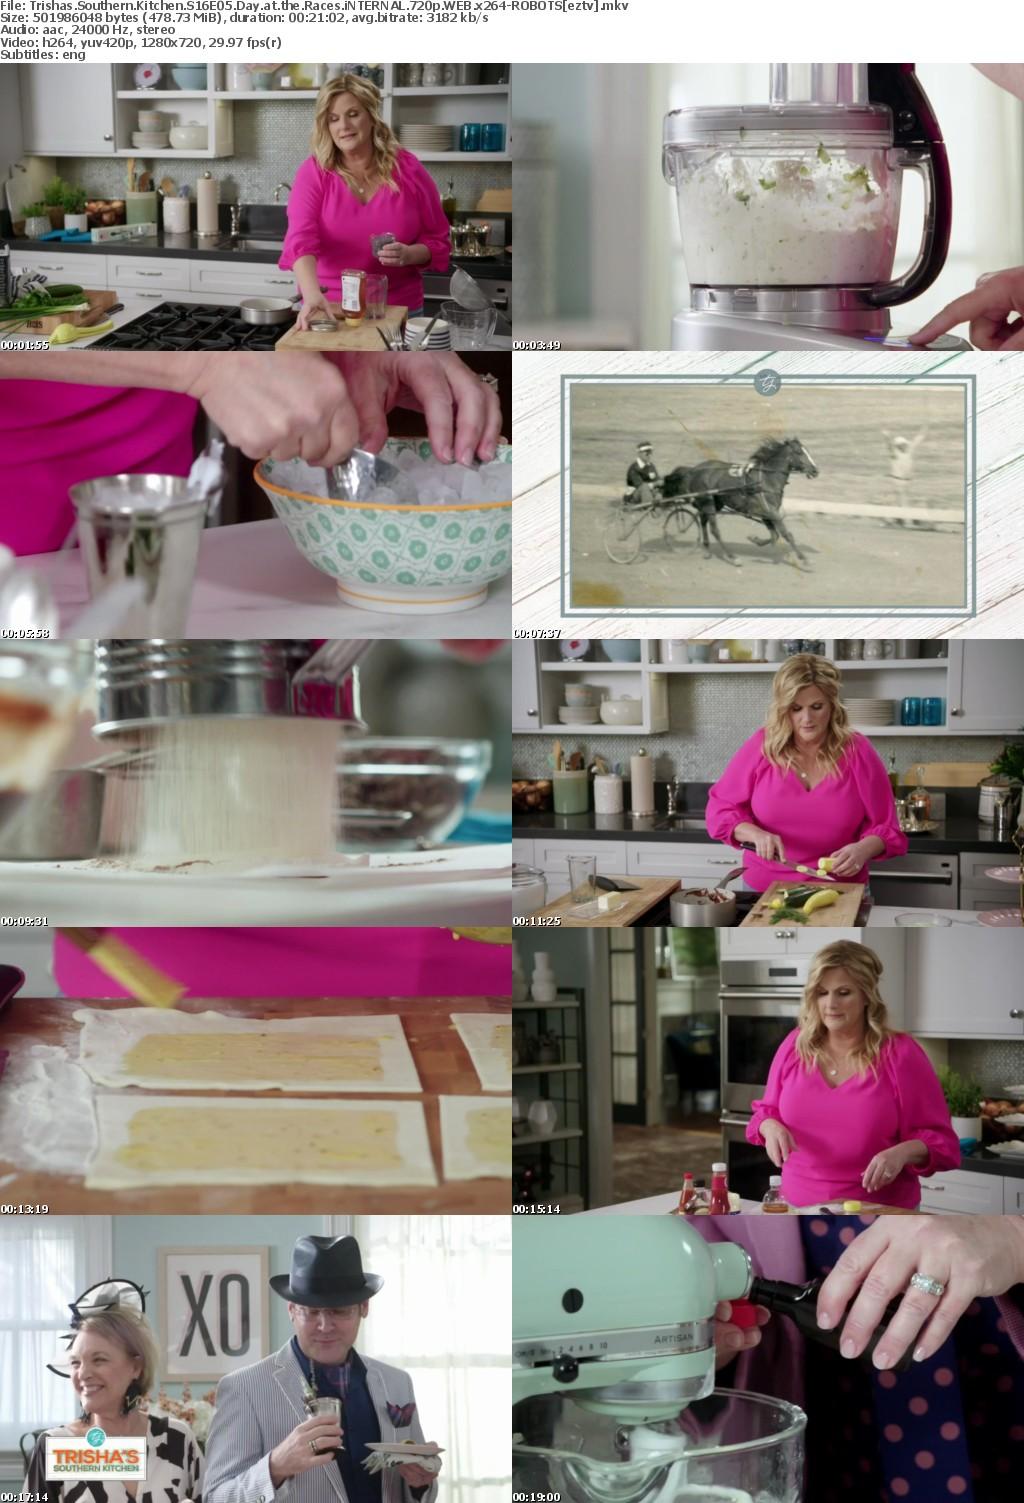 Trishas Southern Kitchen S16E05 Day at the Races iNTERNAL 720p WEB x264-ROBOTS